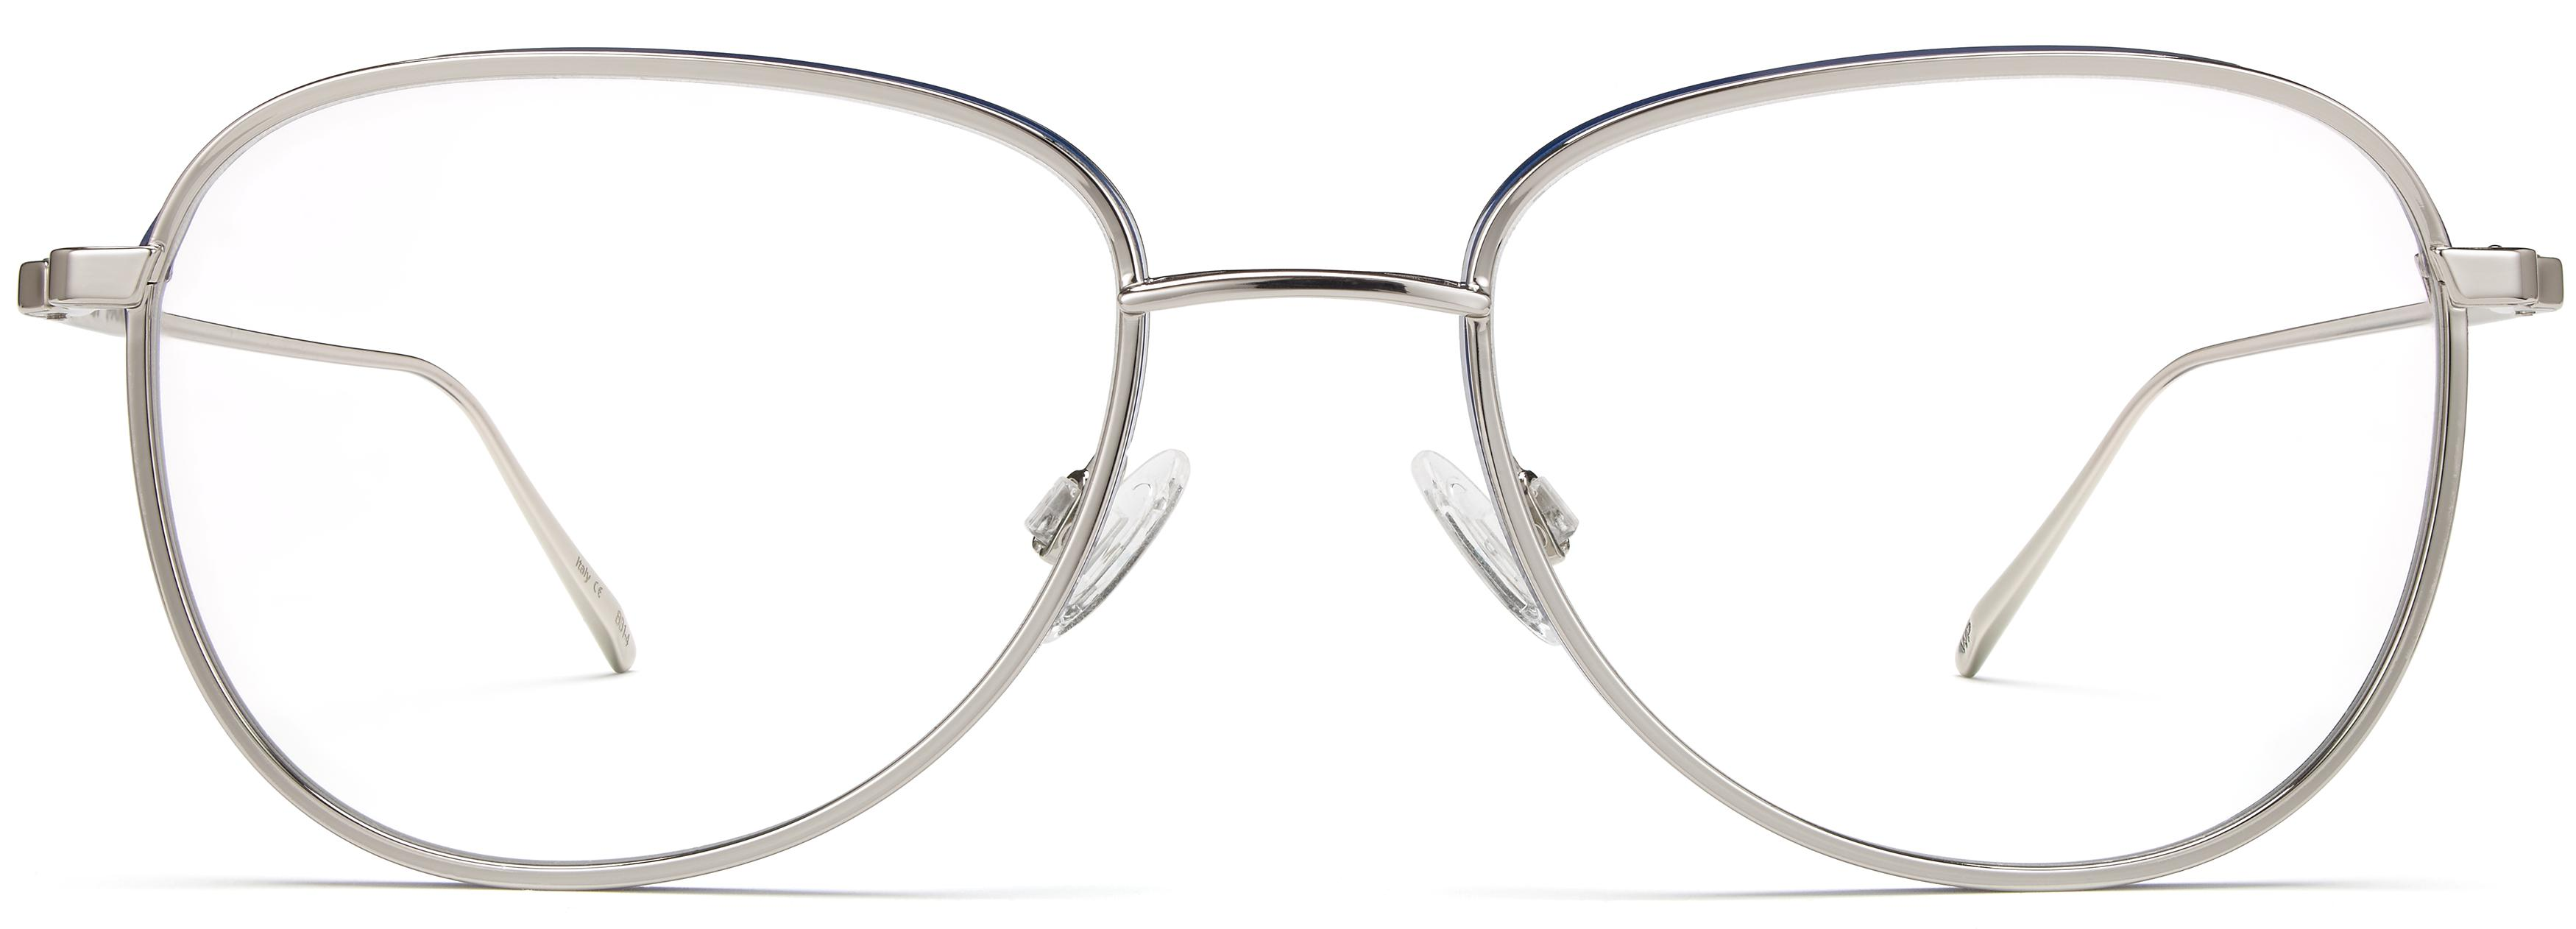 f7876c96f2db Men's Eyeglasses | Warby Parker